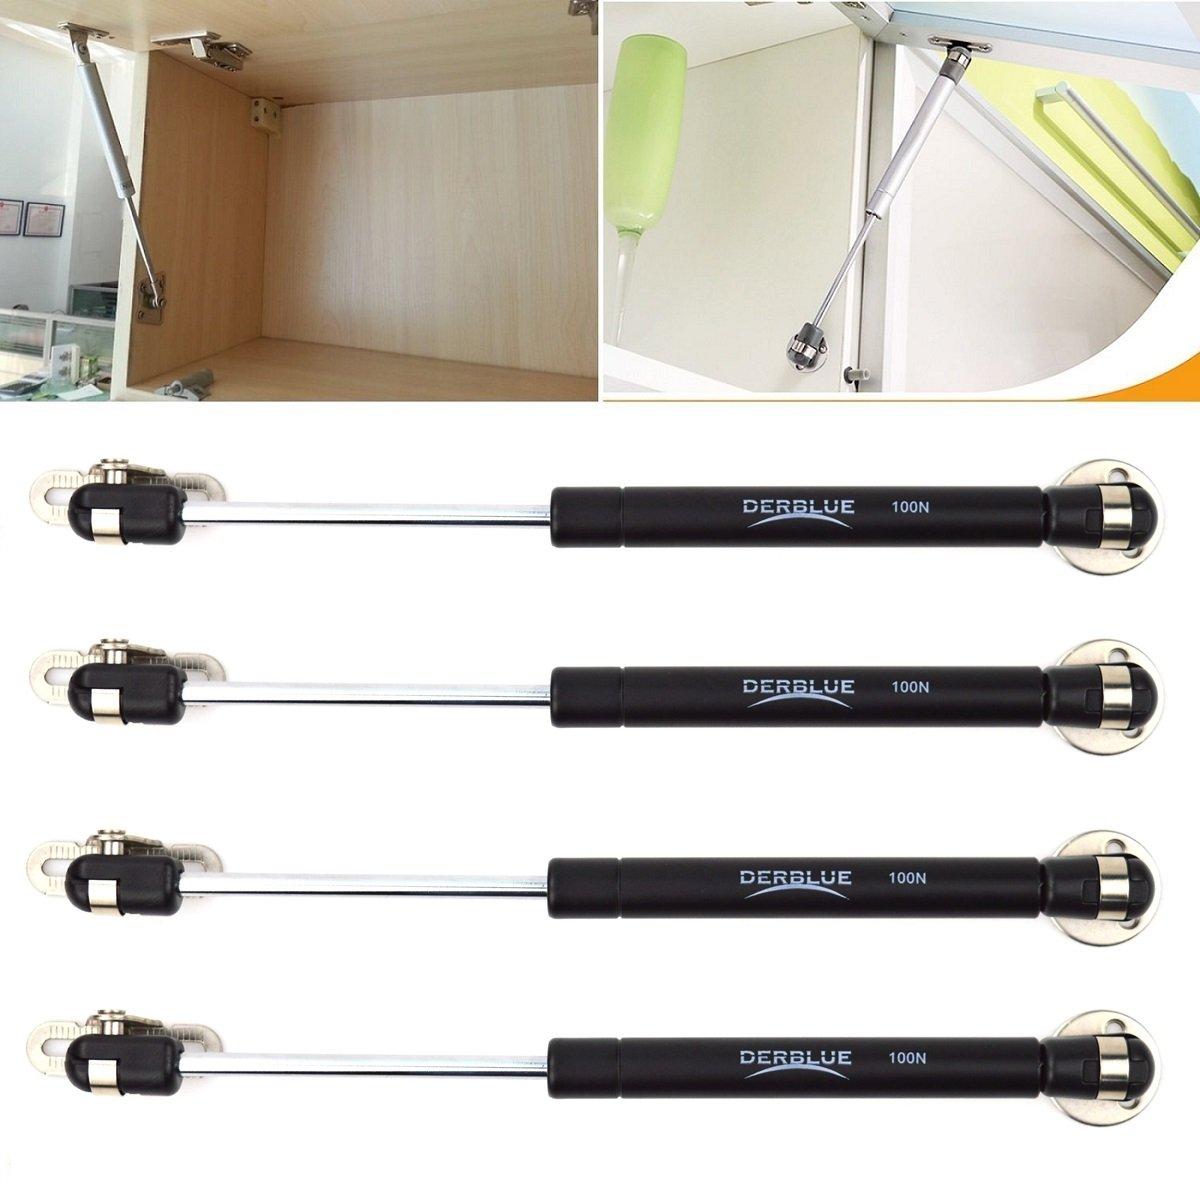 DerBlue 4 Pcs 100N 22.5lb Gas Strut Lift Support Cabinet Door Lift Pneumatic Support black